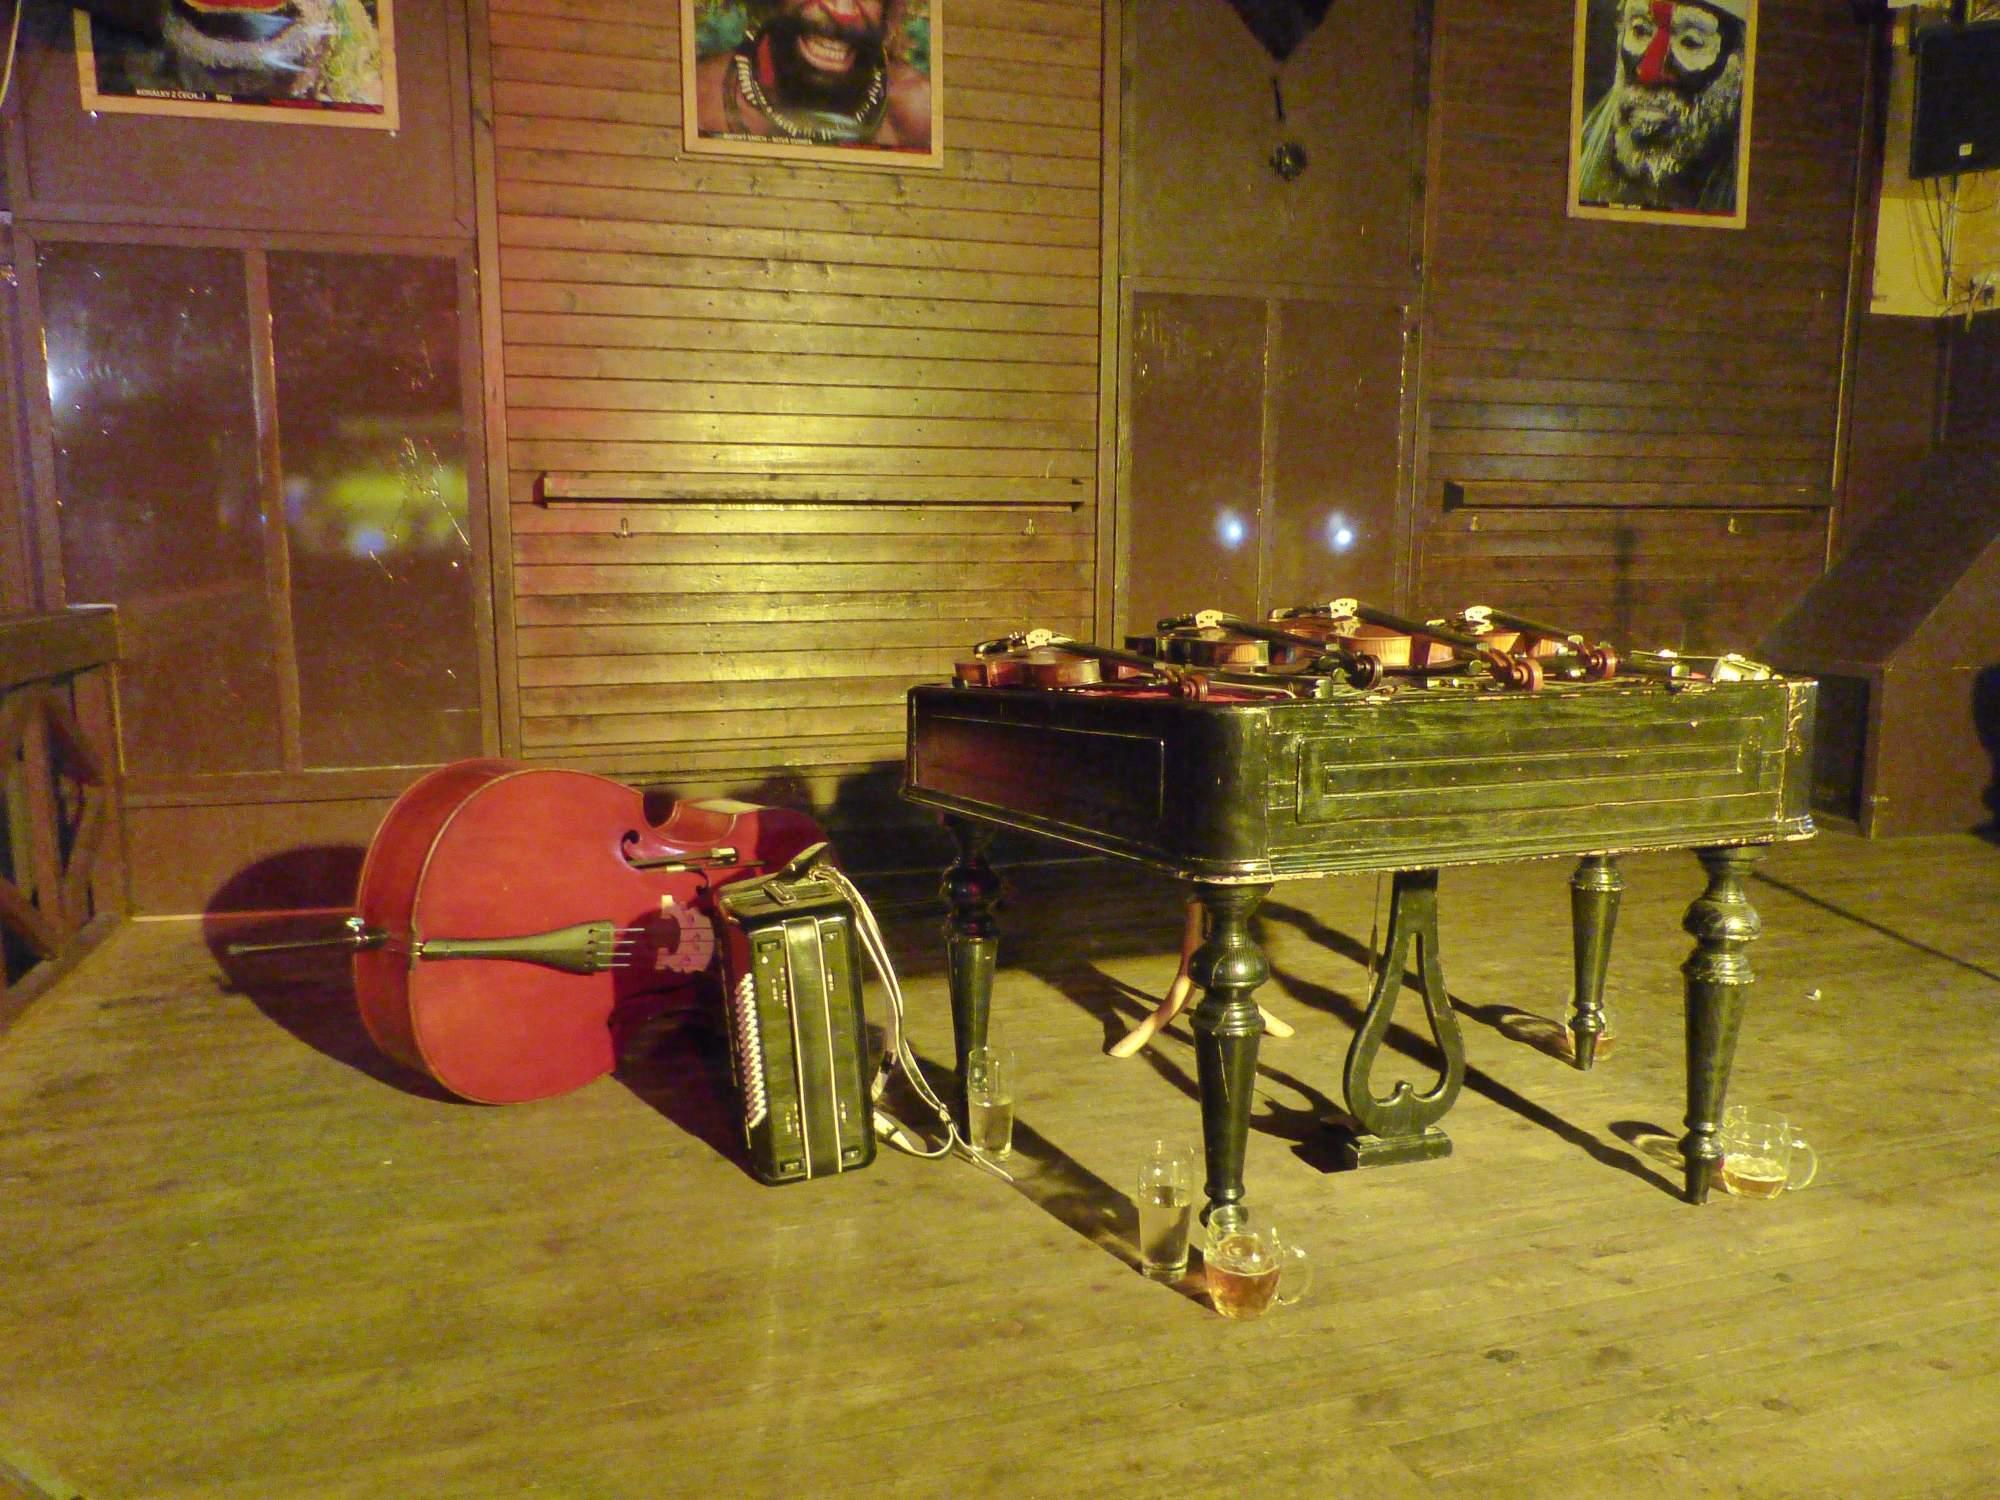 Hudobné nástroje Poľany. Foto: Vanesa Čierna